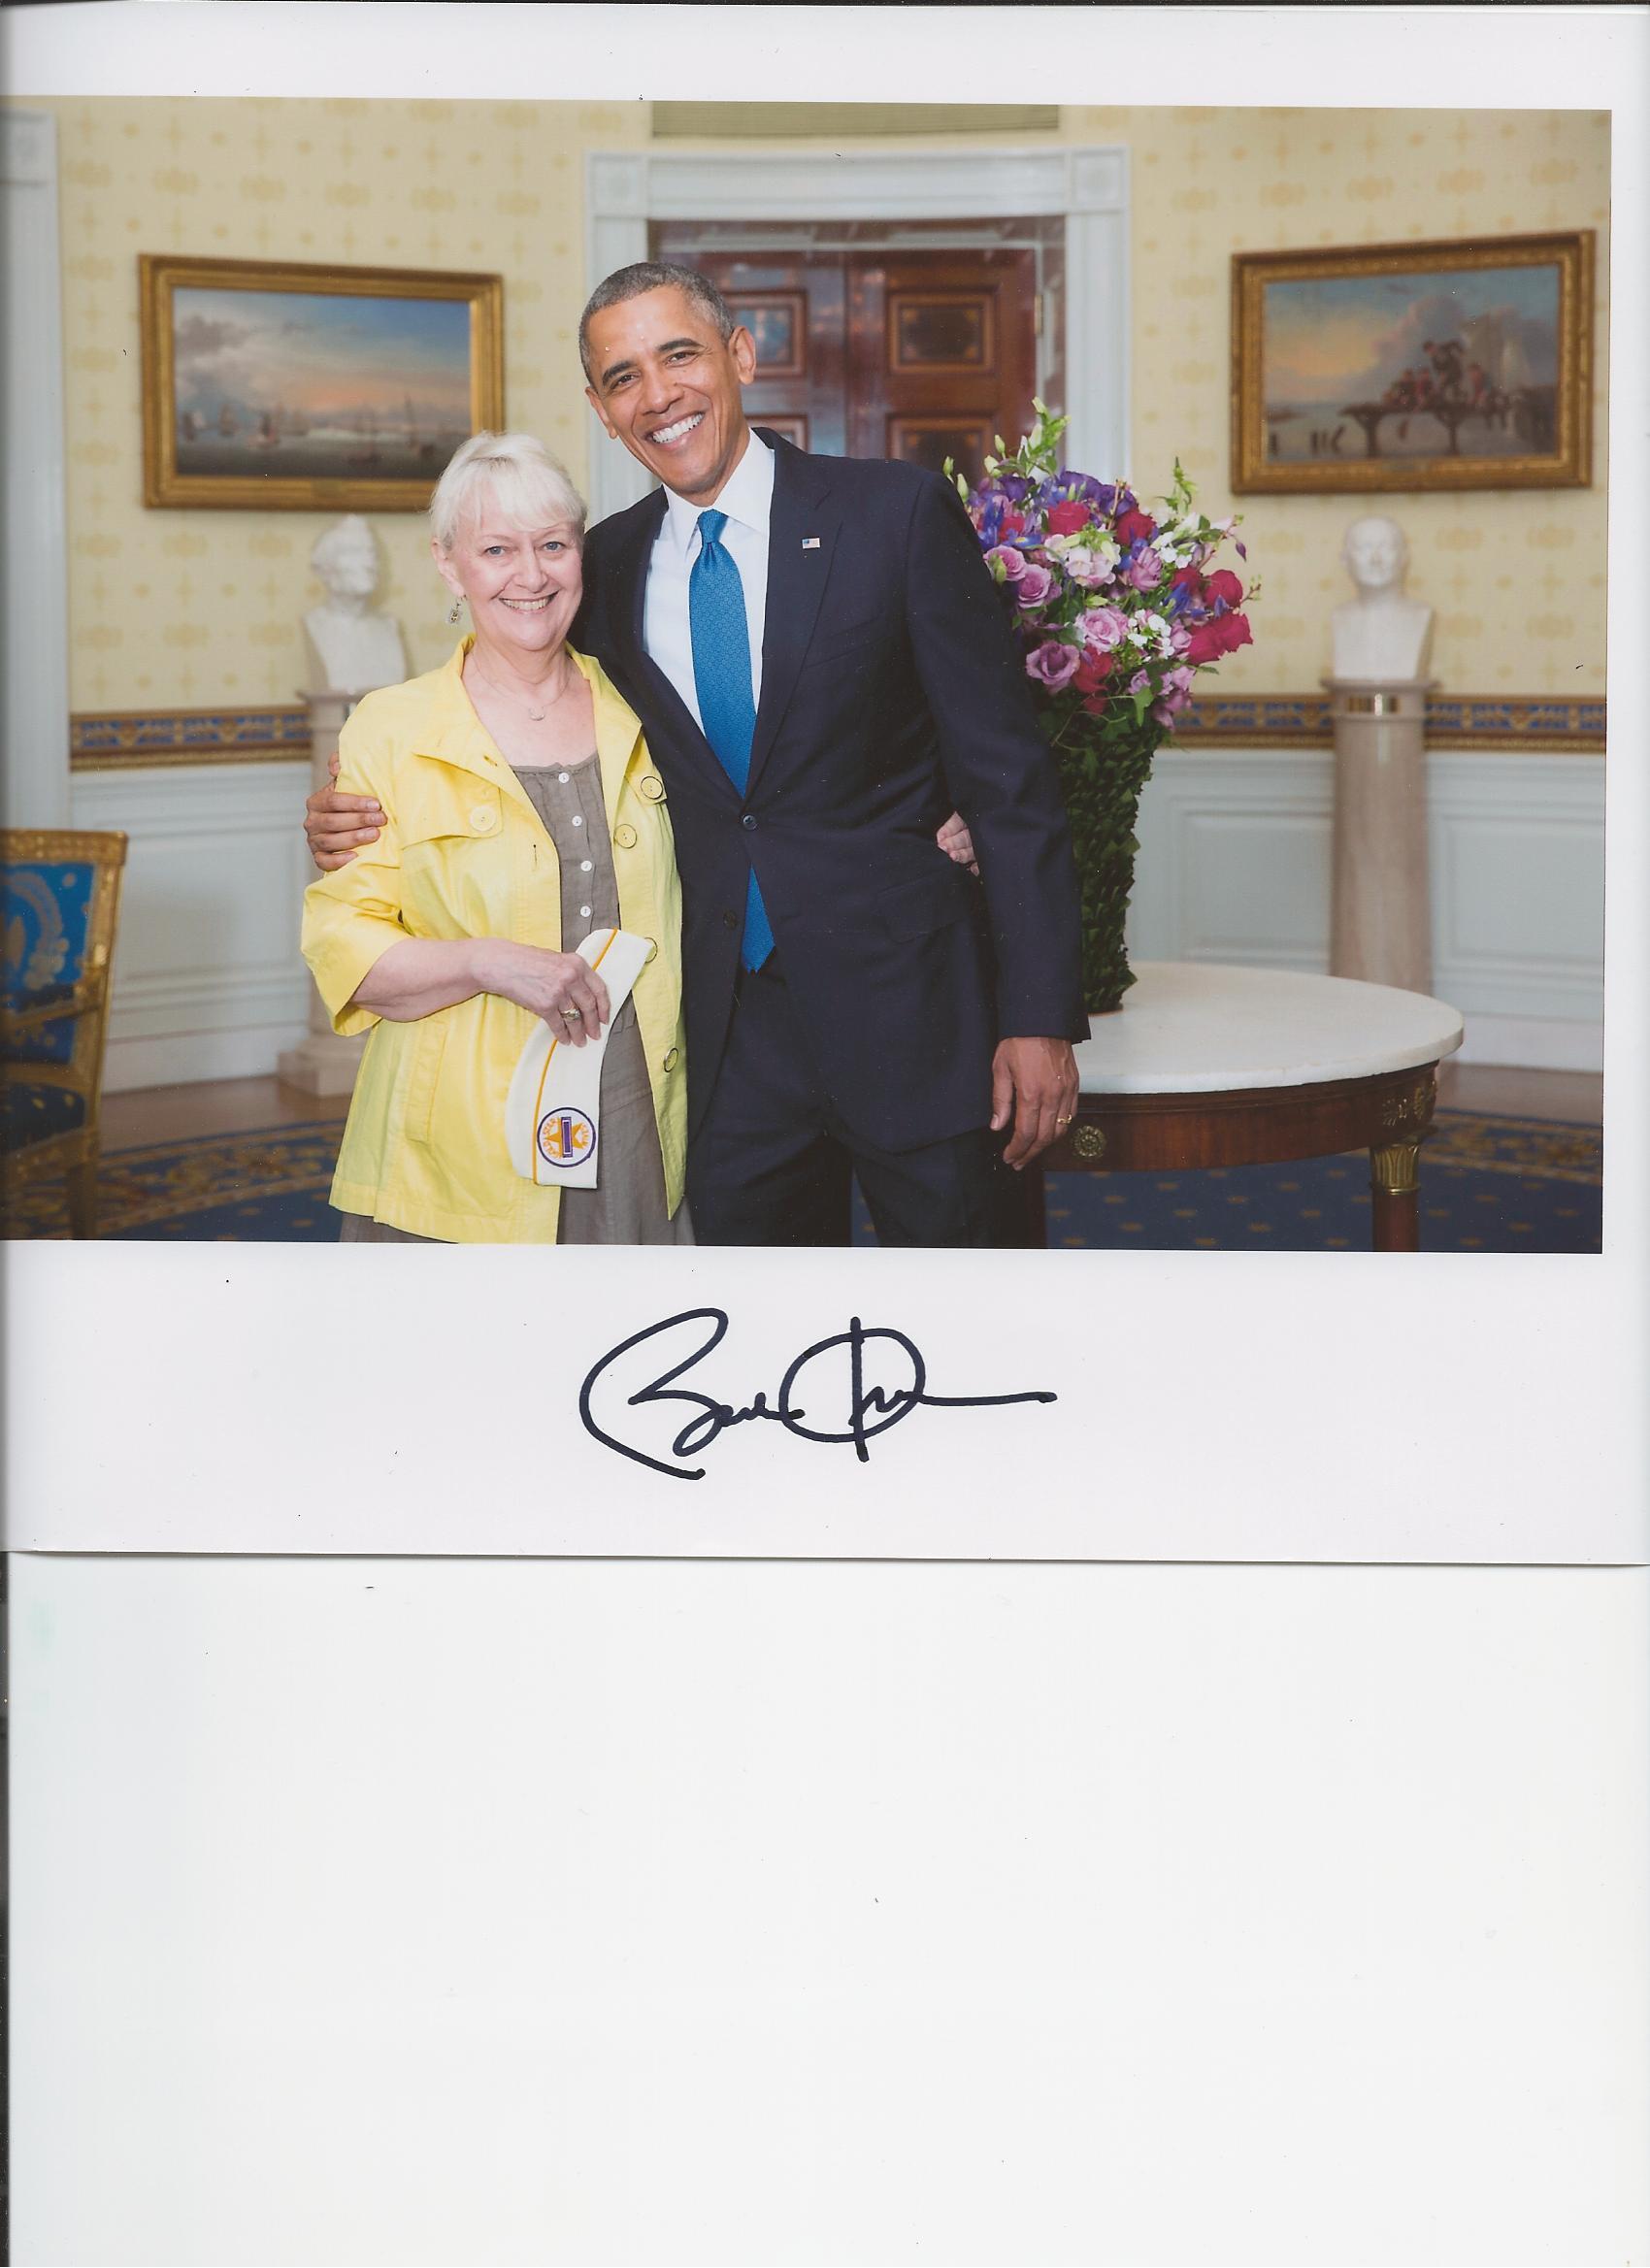 Ruth & President